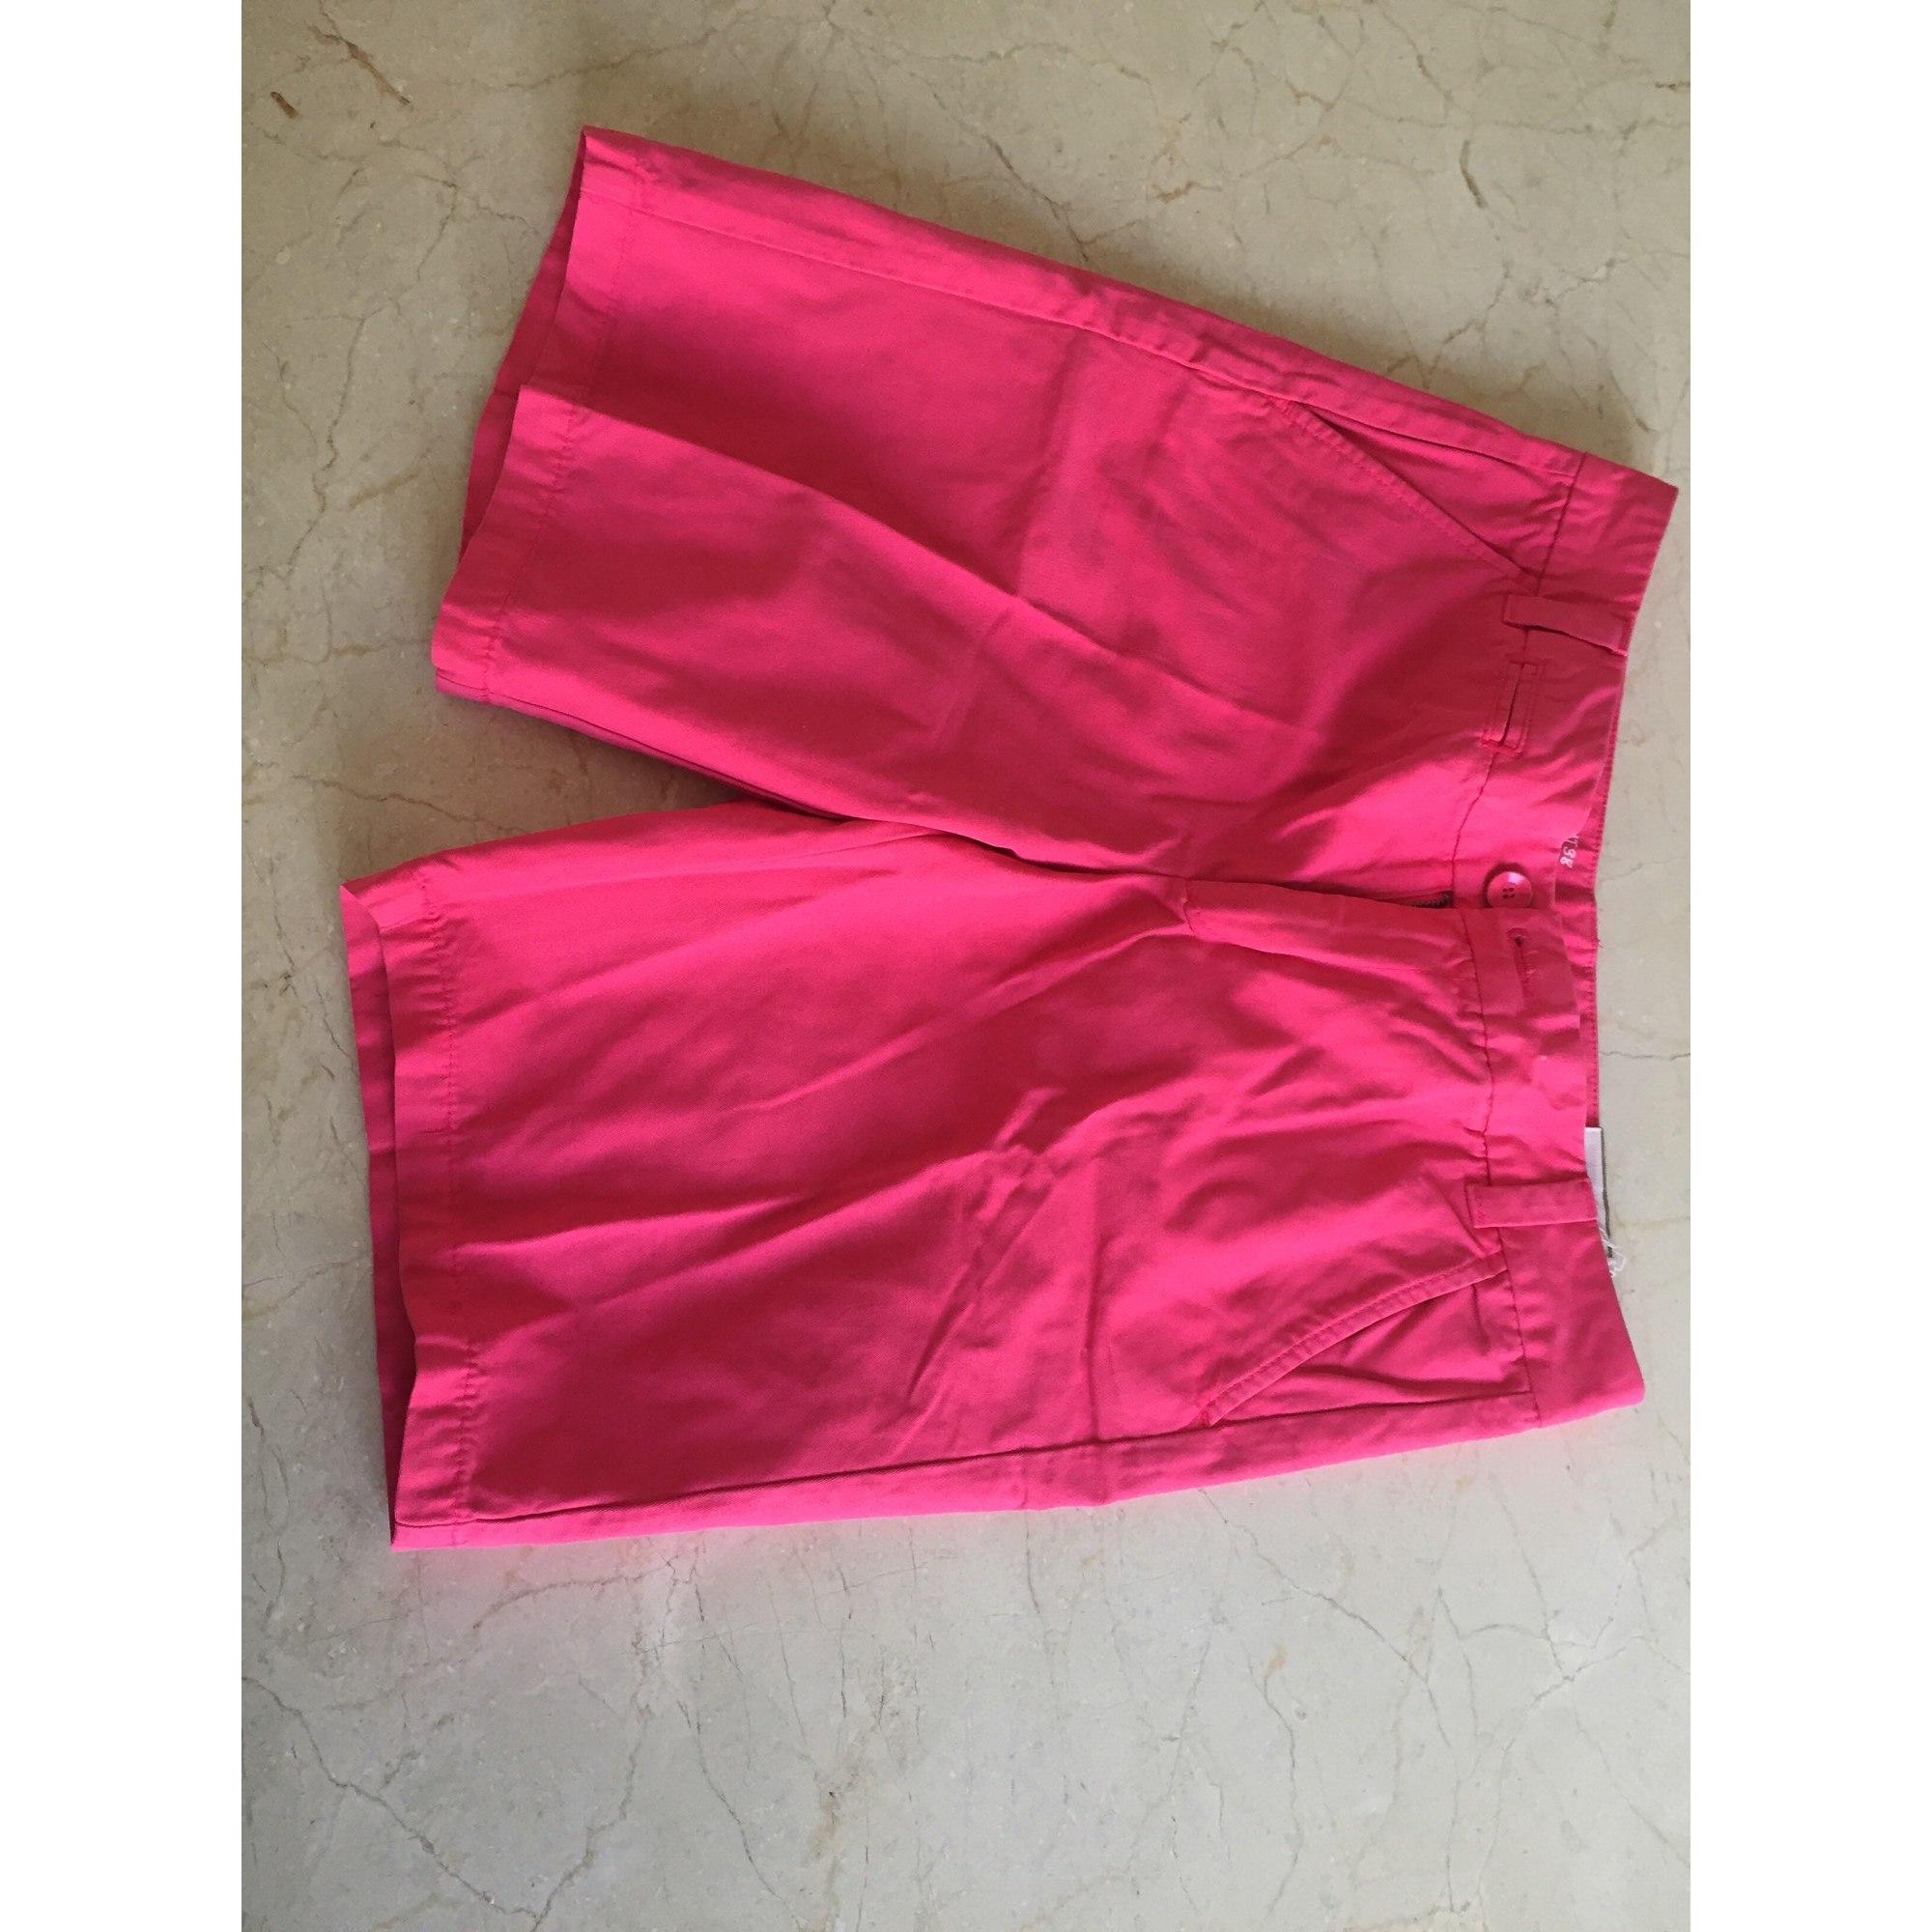 7/8 Hose, Caprihose GAP Pink,  altrosa